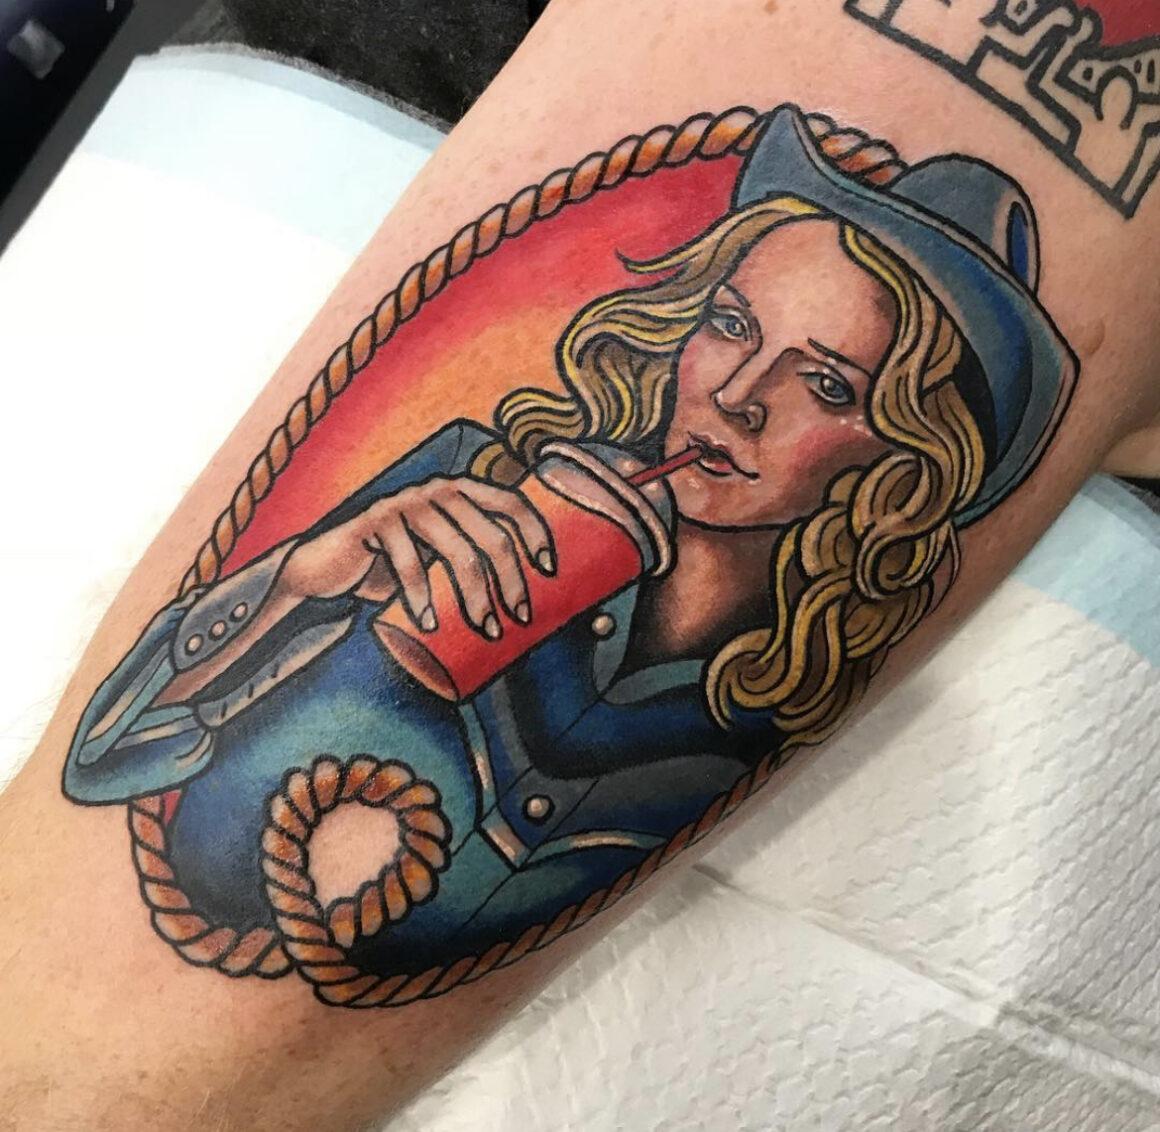 Sarah-K, Heartbreakers Tattoo Club, Adelaide, Australia